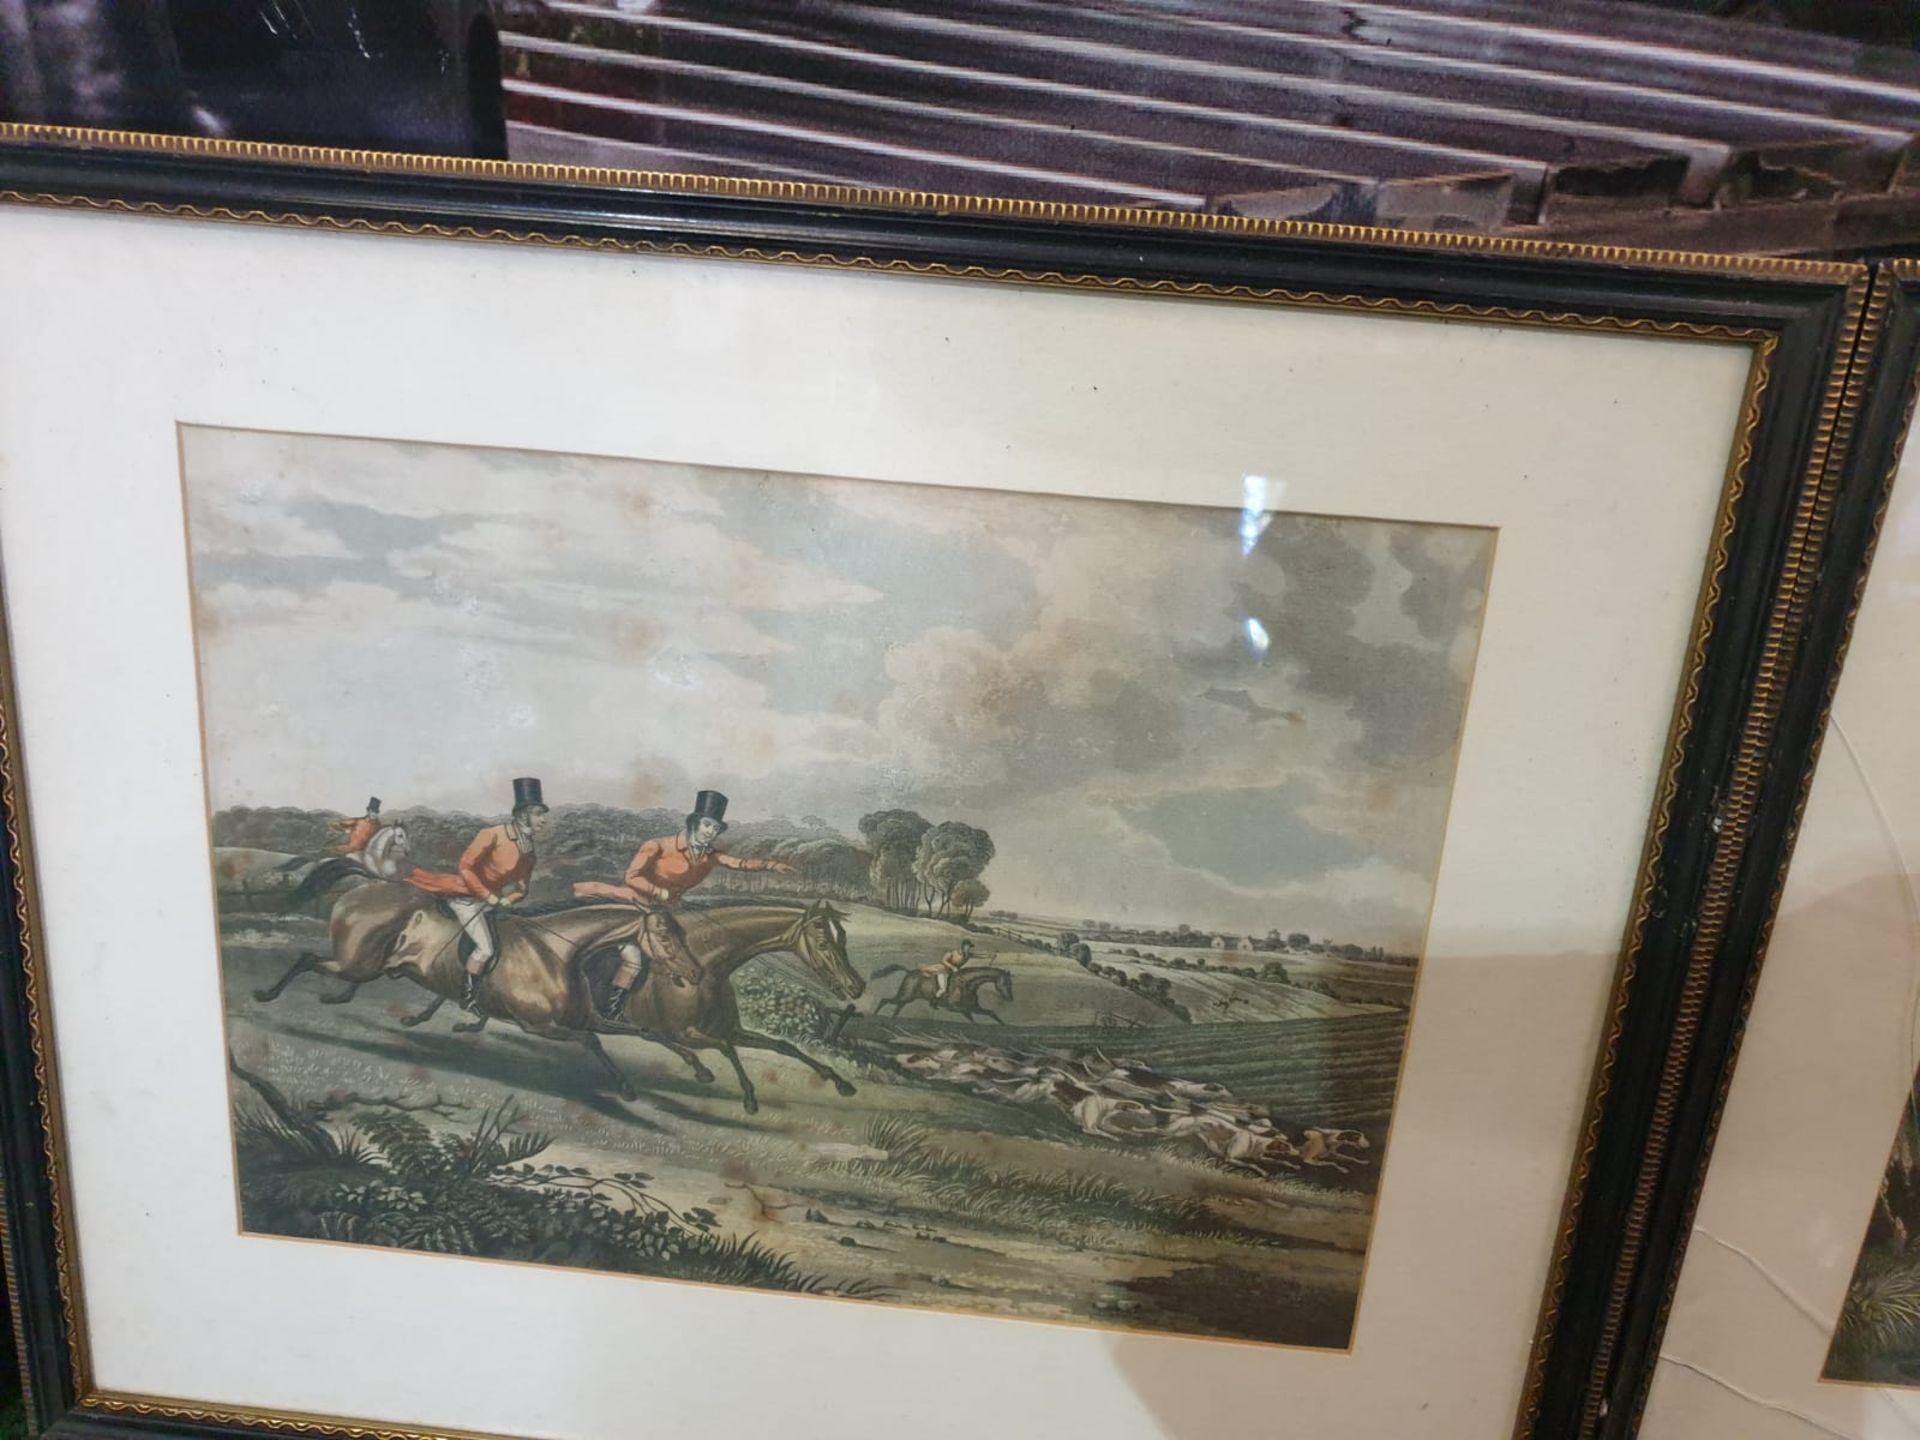 Set of 4 hunting aquatint prints in Black frame-50 x 42cm - Image 6 of 6